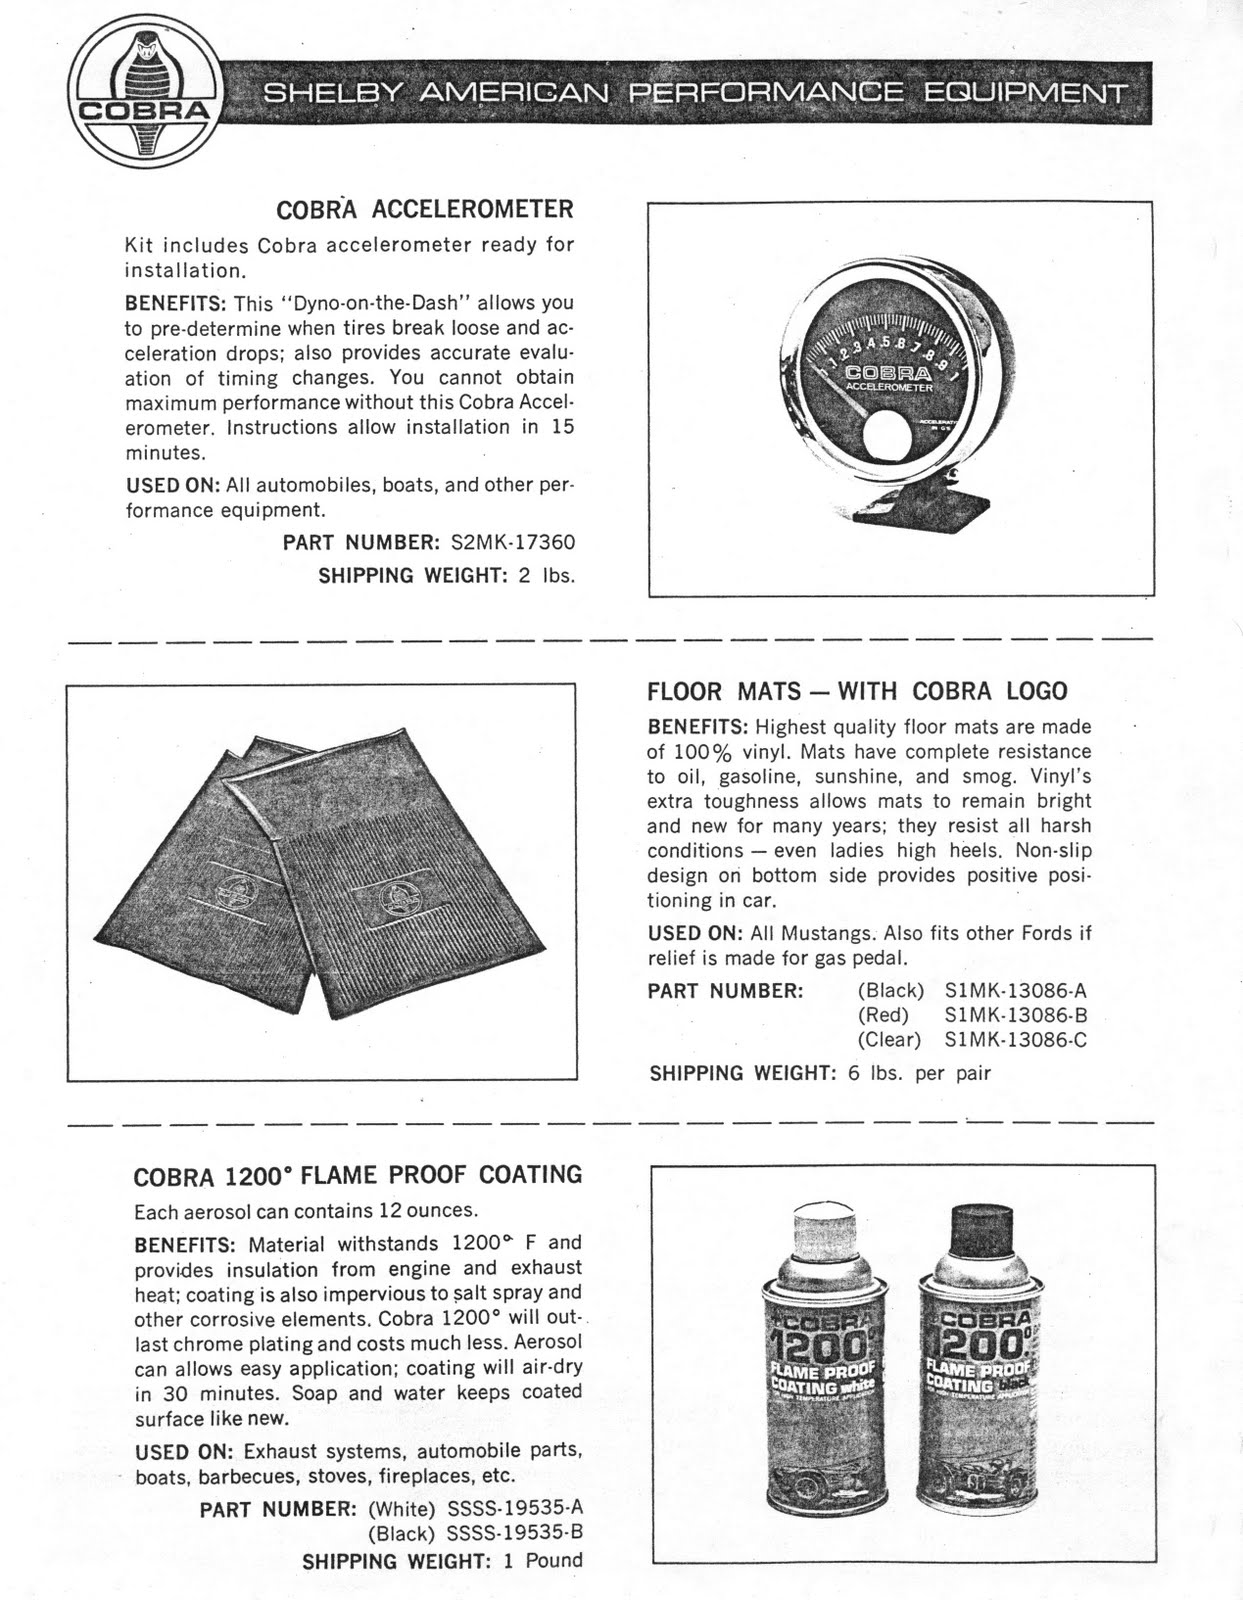 Virginia Classic Mustang Blog: Shelby Cobra Floor Mats